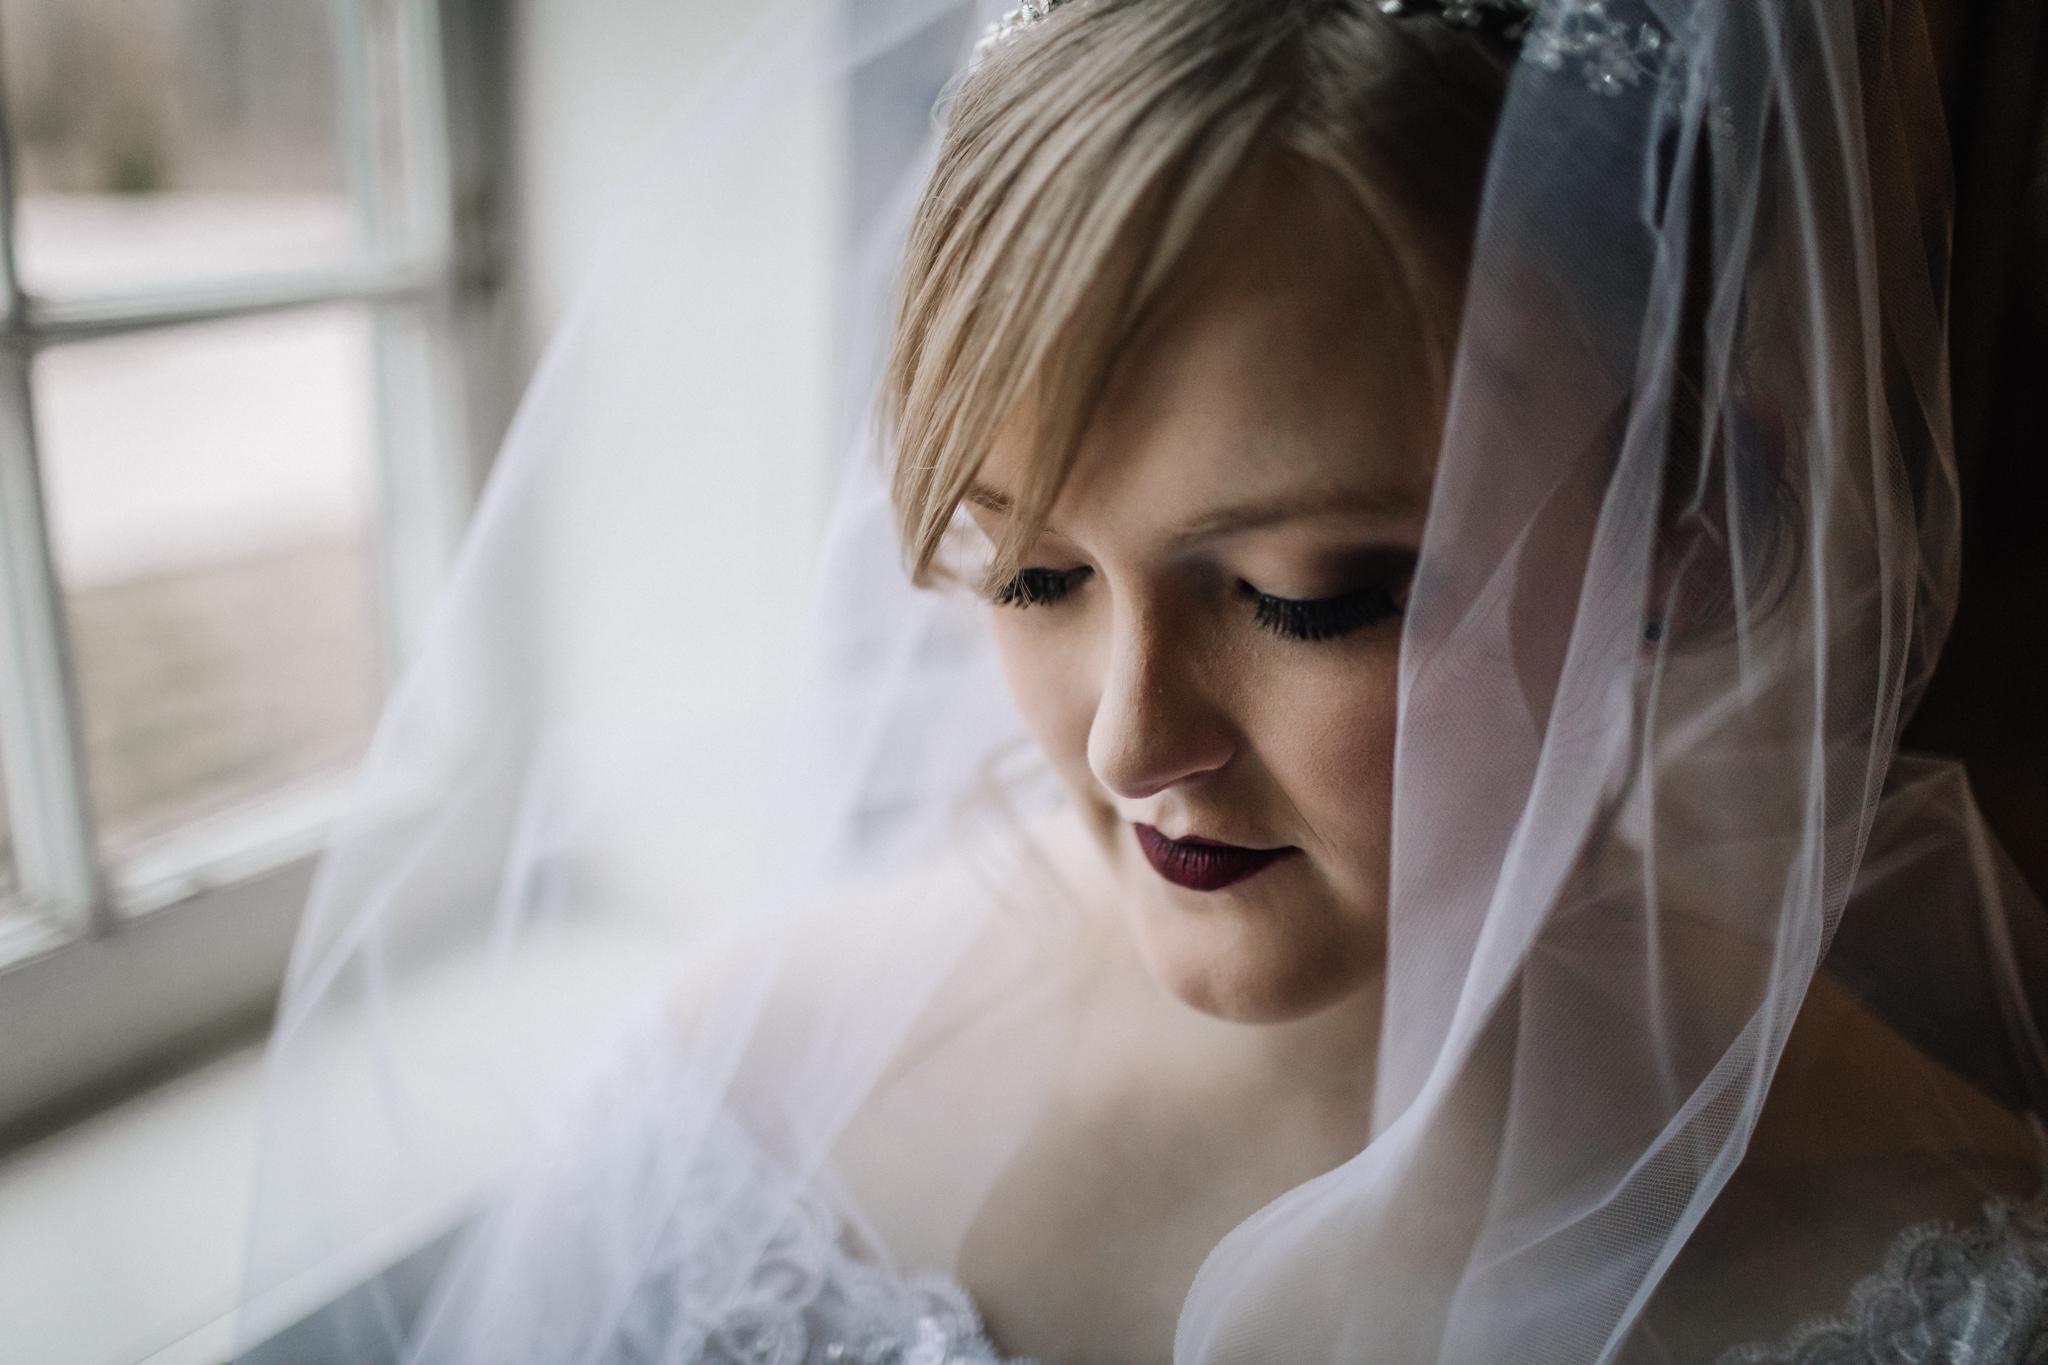 billie-shaye-style-photography-www.billieshayestyle.com-winter-wedding-the-belle-hollow-clarksville-tennessee-9475.jpg